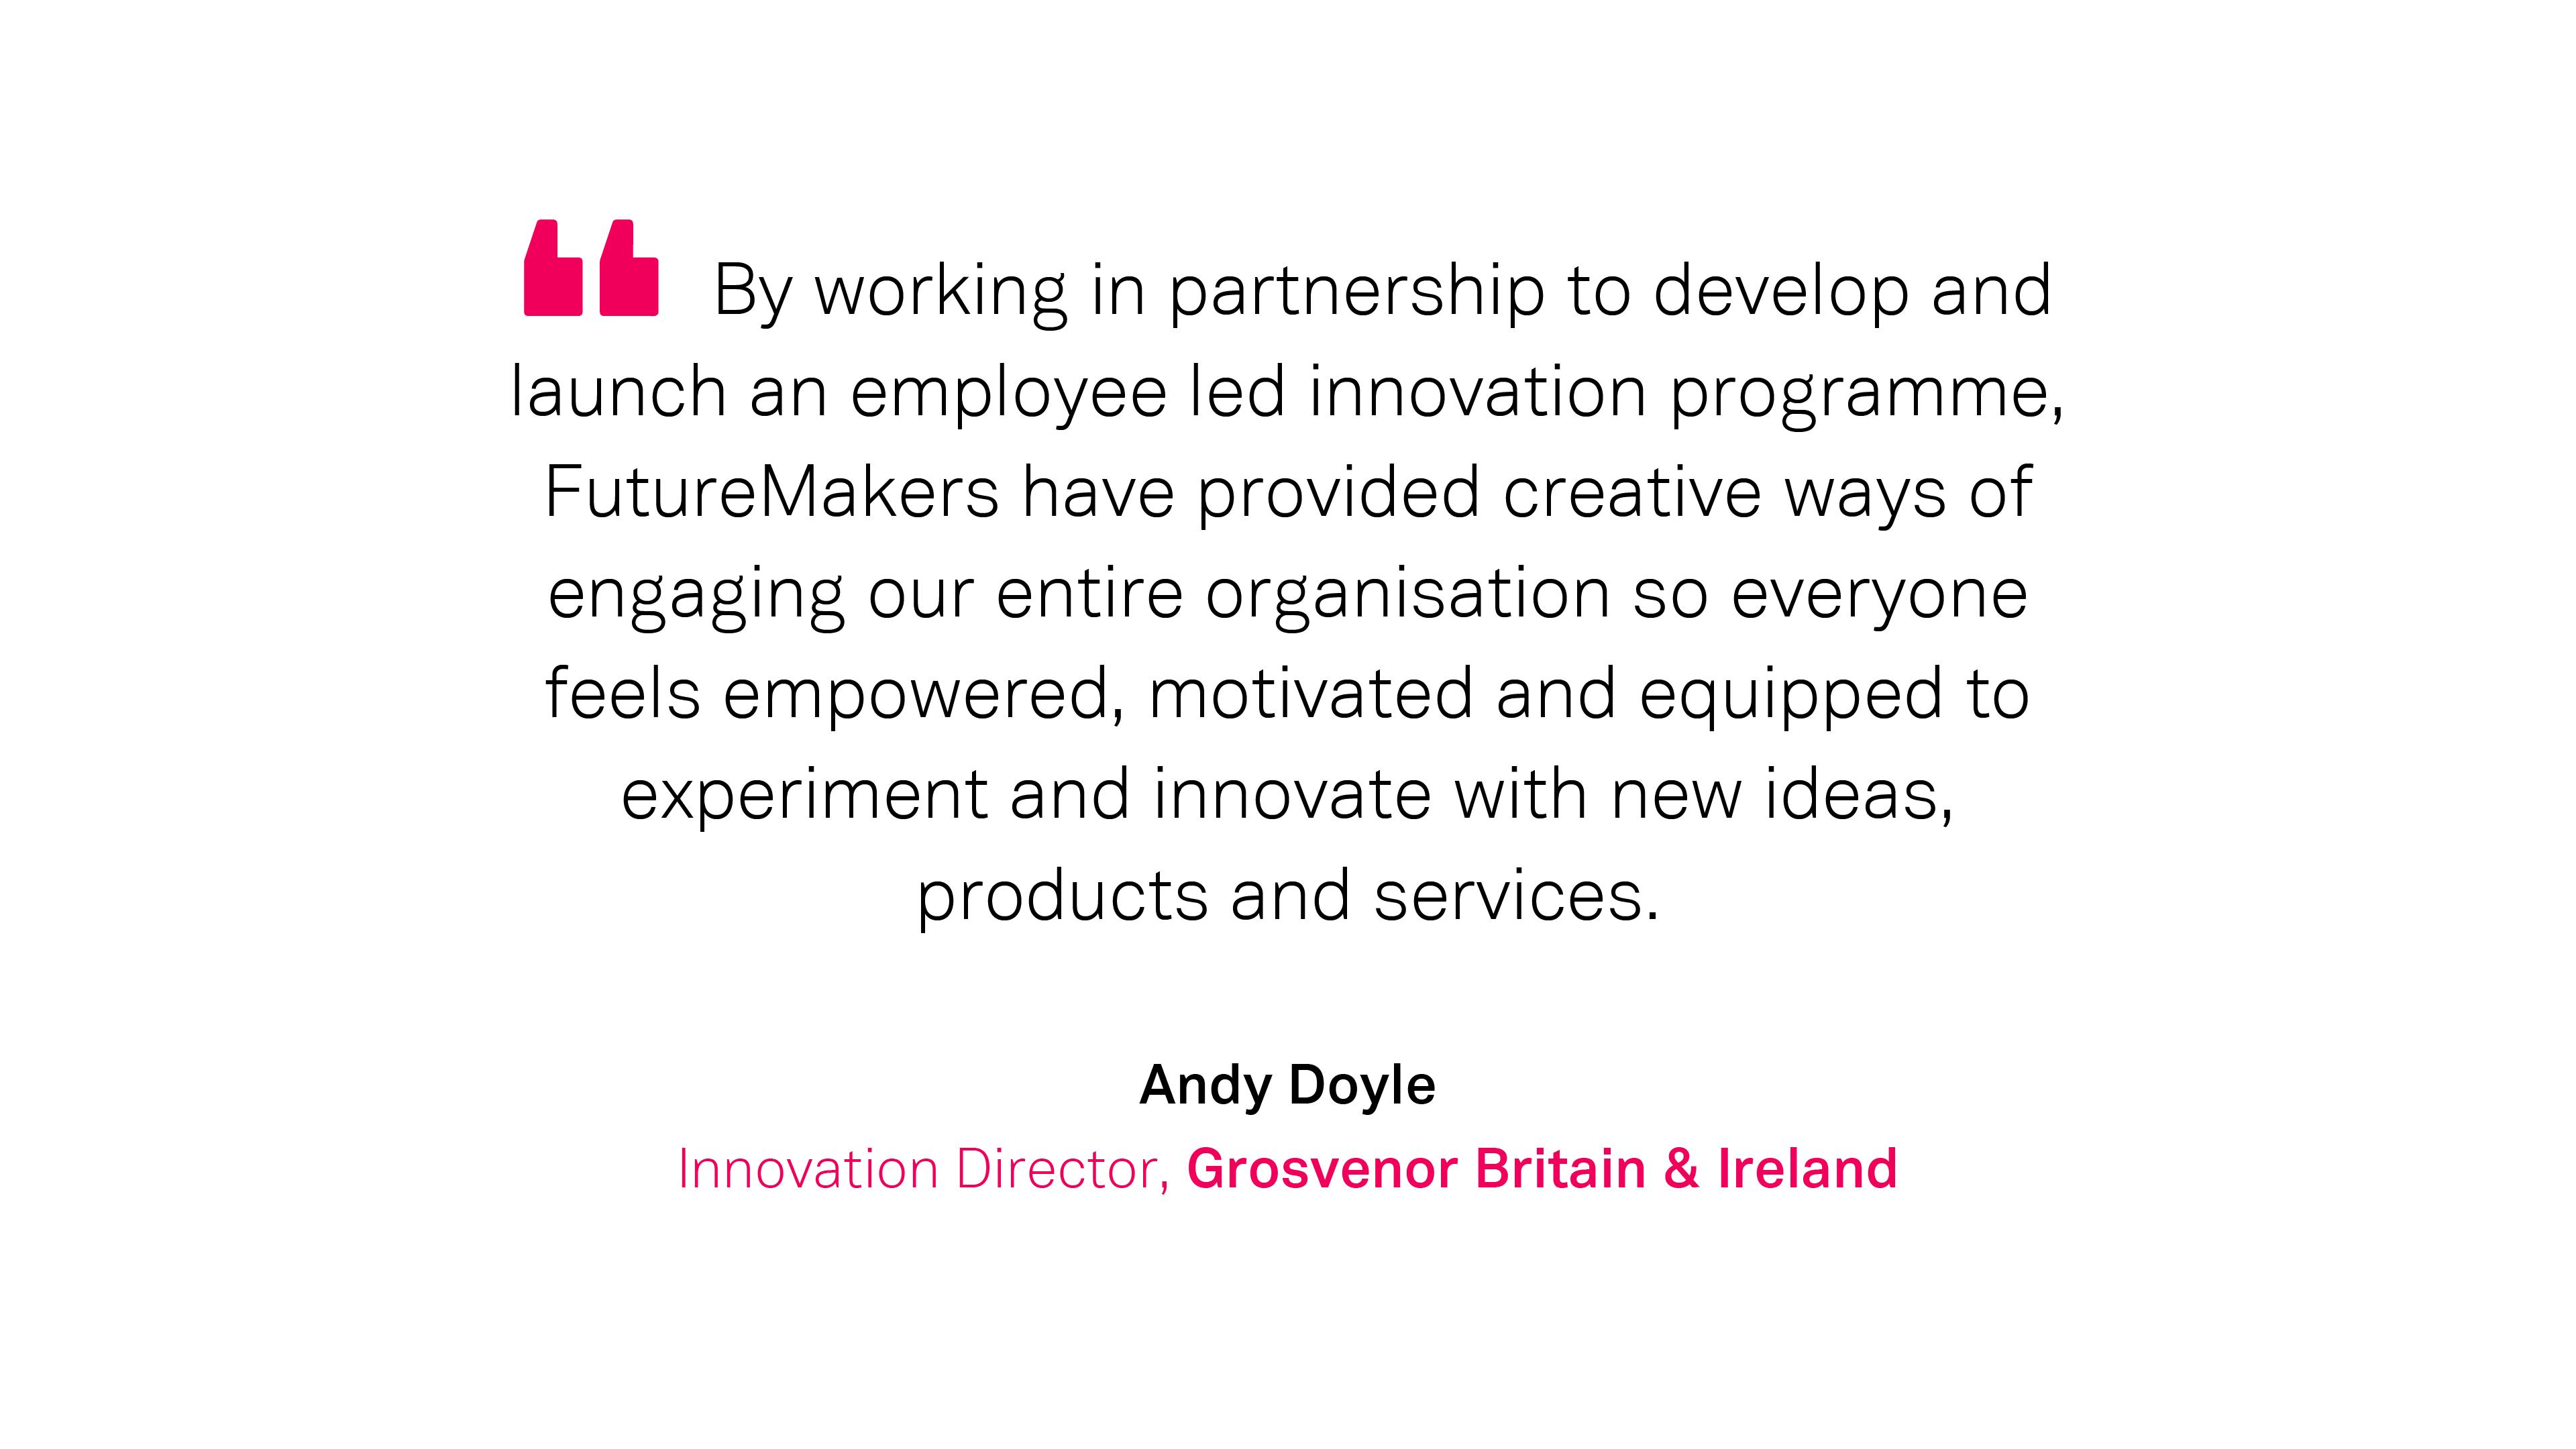 Our Work: Andy Doyle, Grosvenor